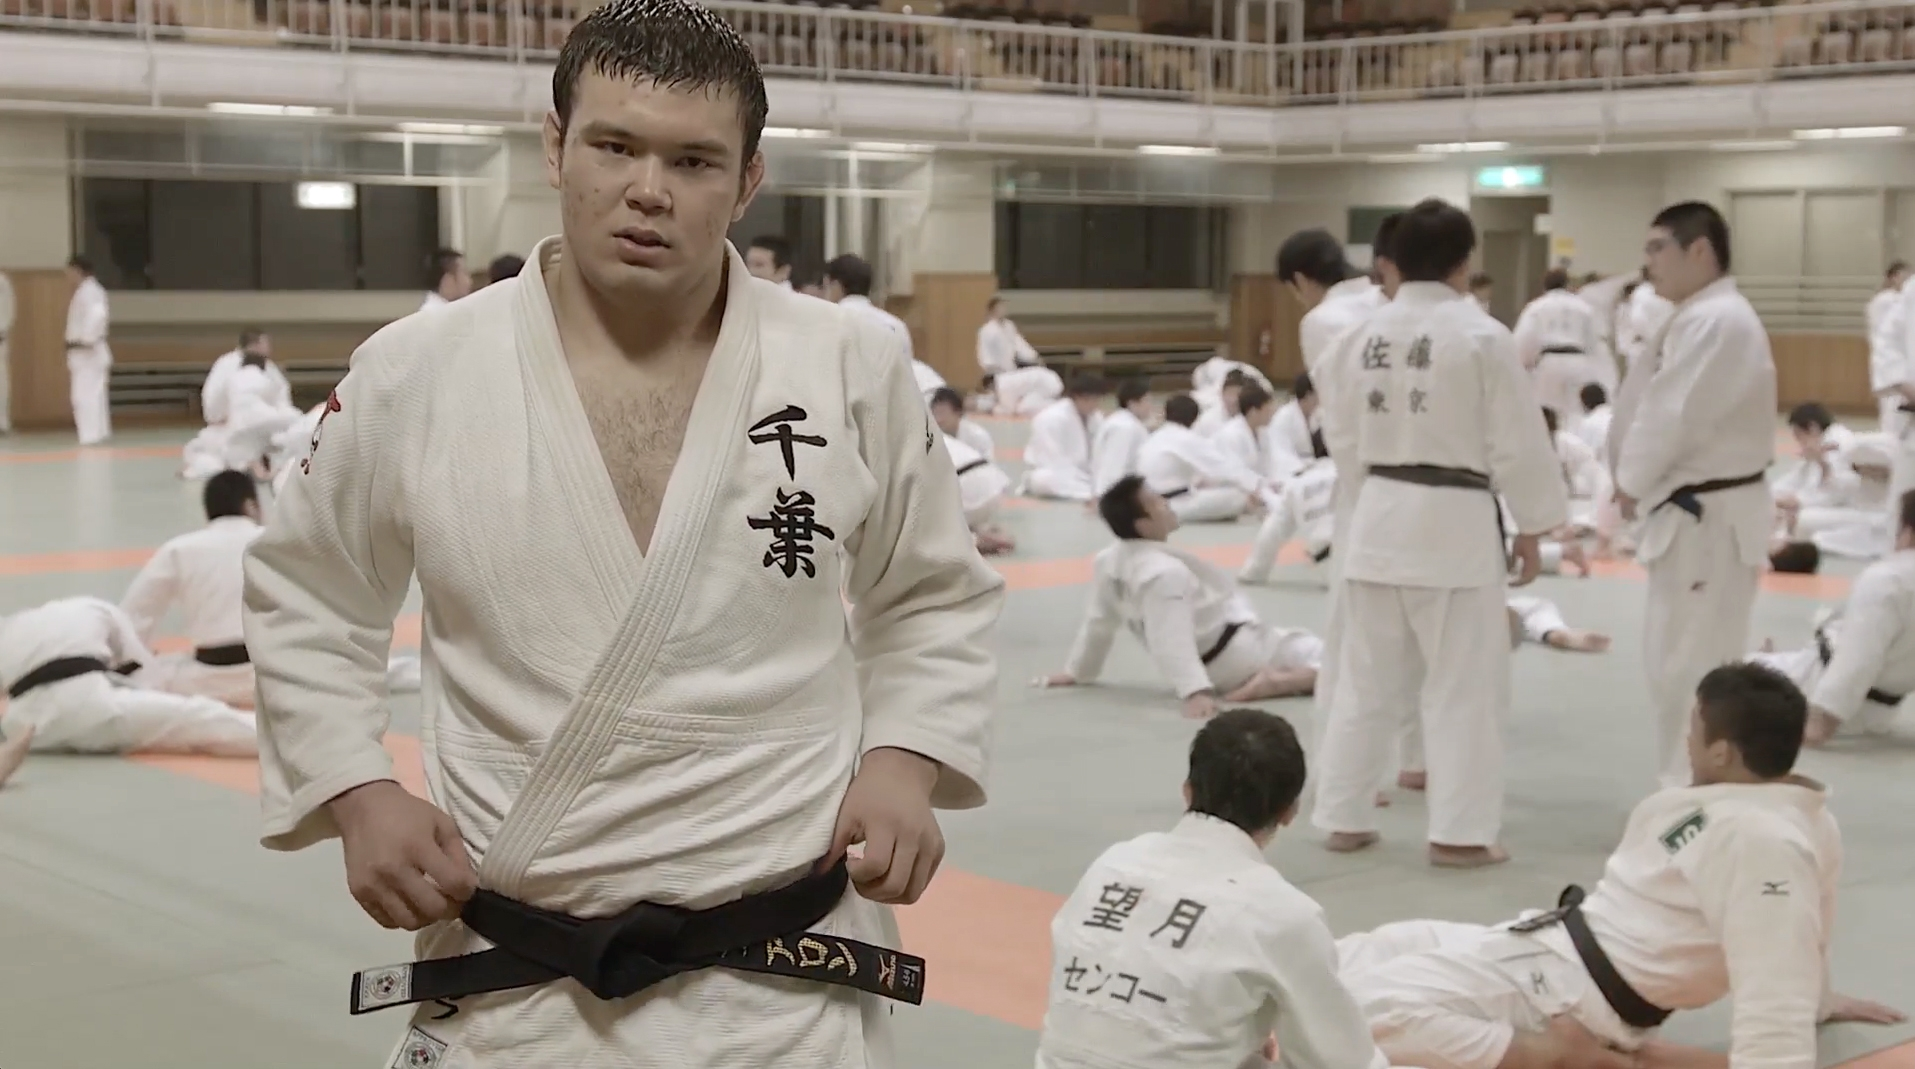 Winning National Judo Titles